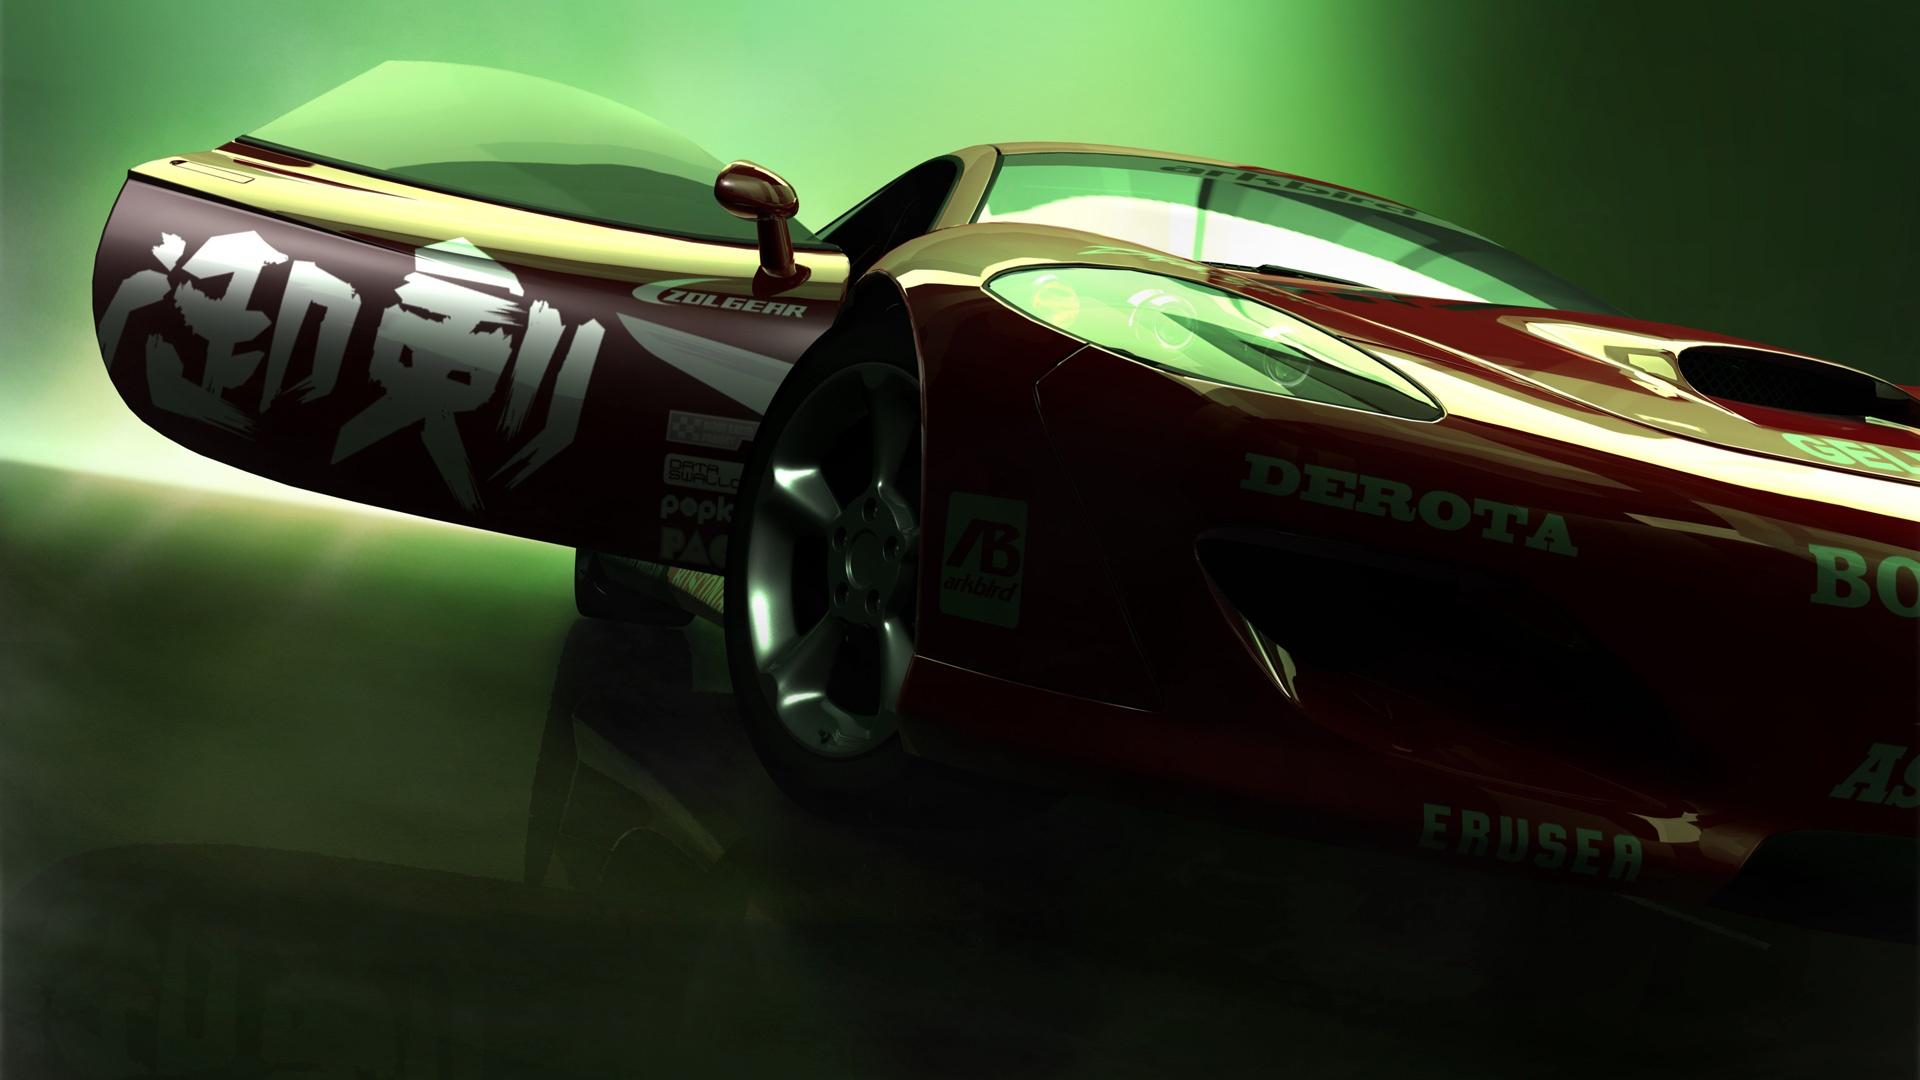 Download Ridge Racer 1080p Hd Car Wallpapers Hd Wallpapers